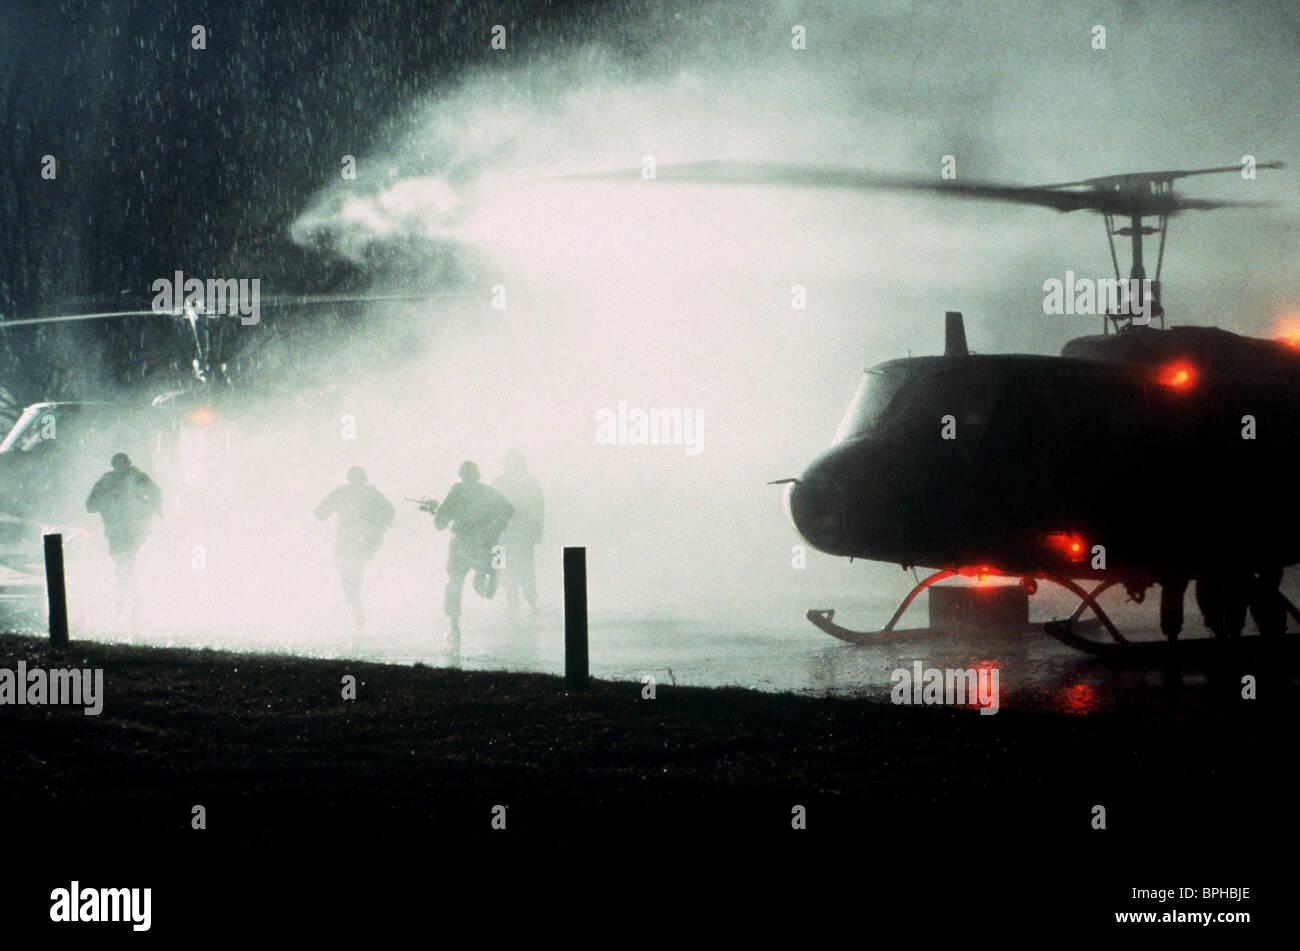 HELICOPTER SCENE SPY GAME (2001) - Stock Image